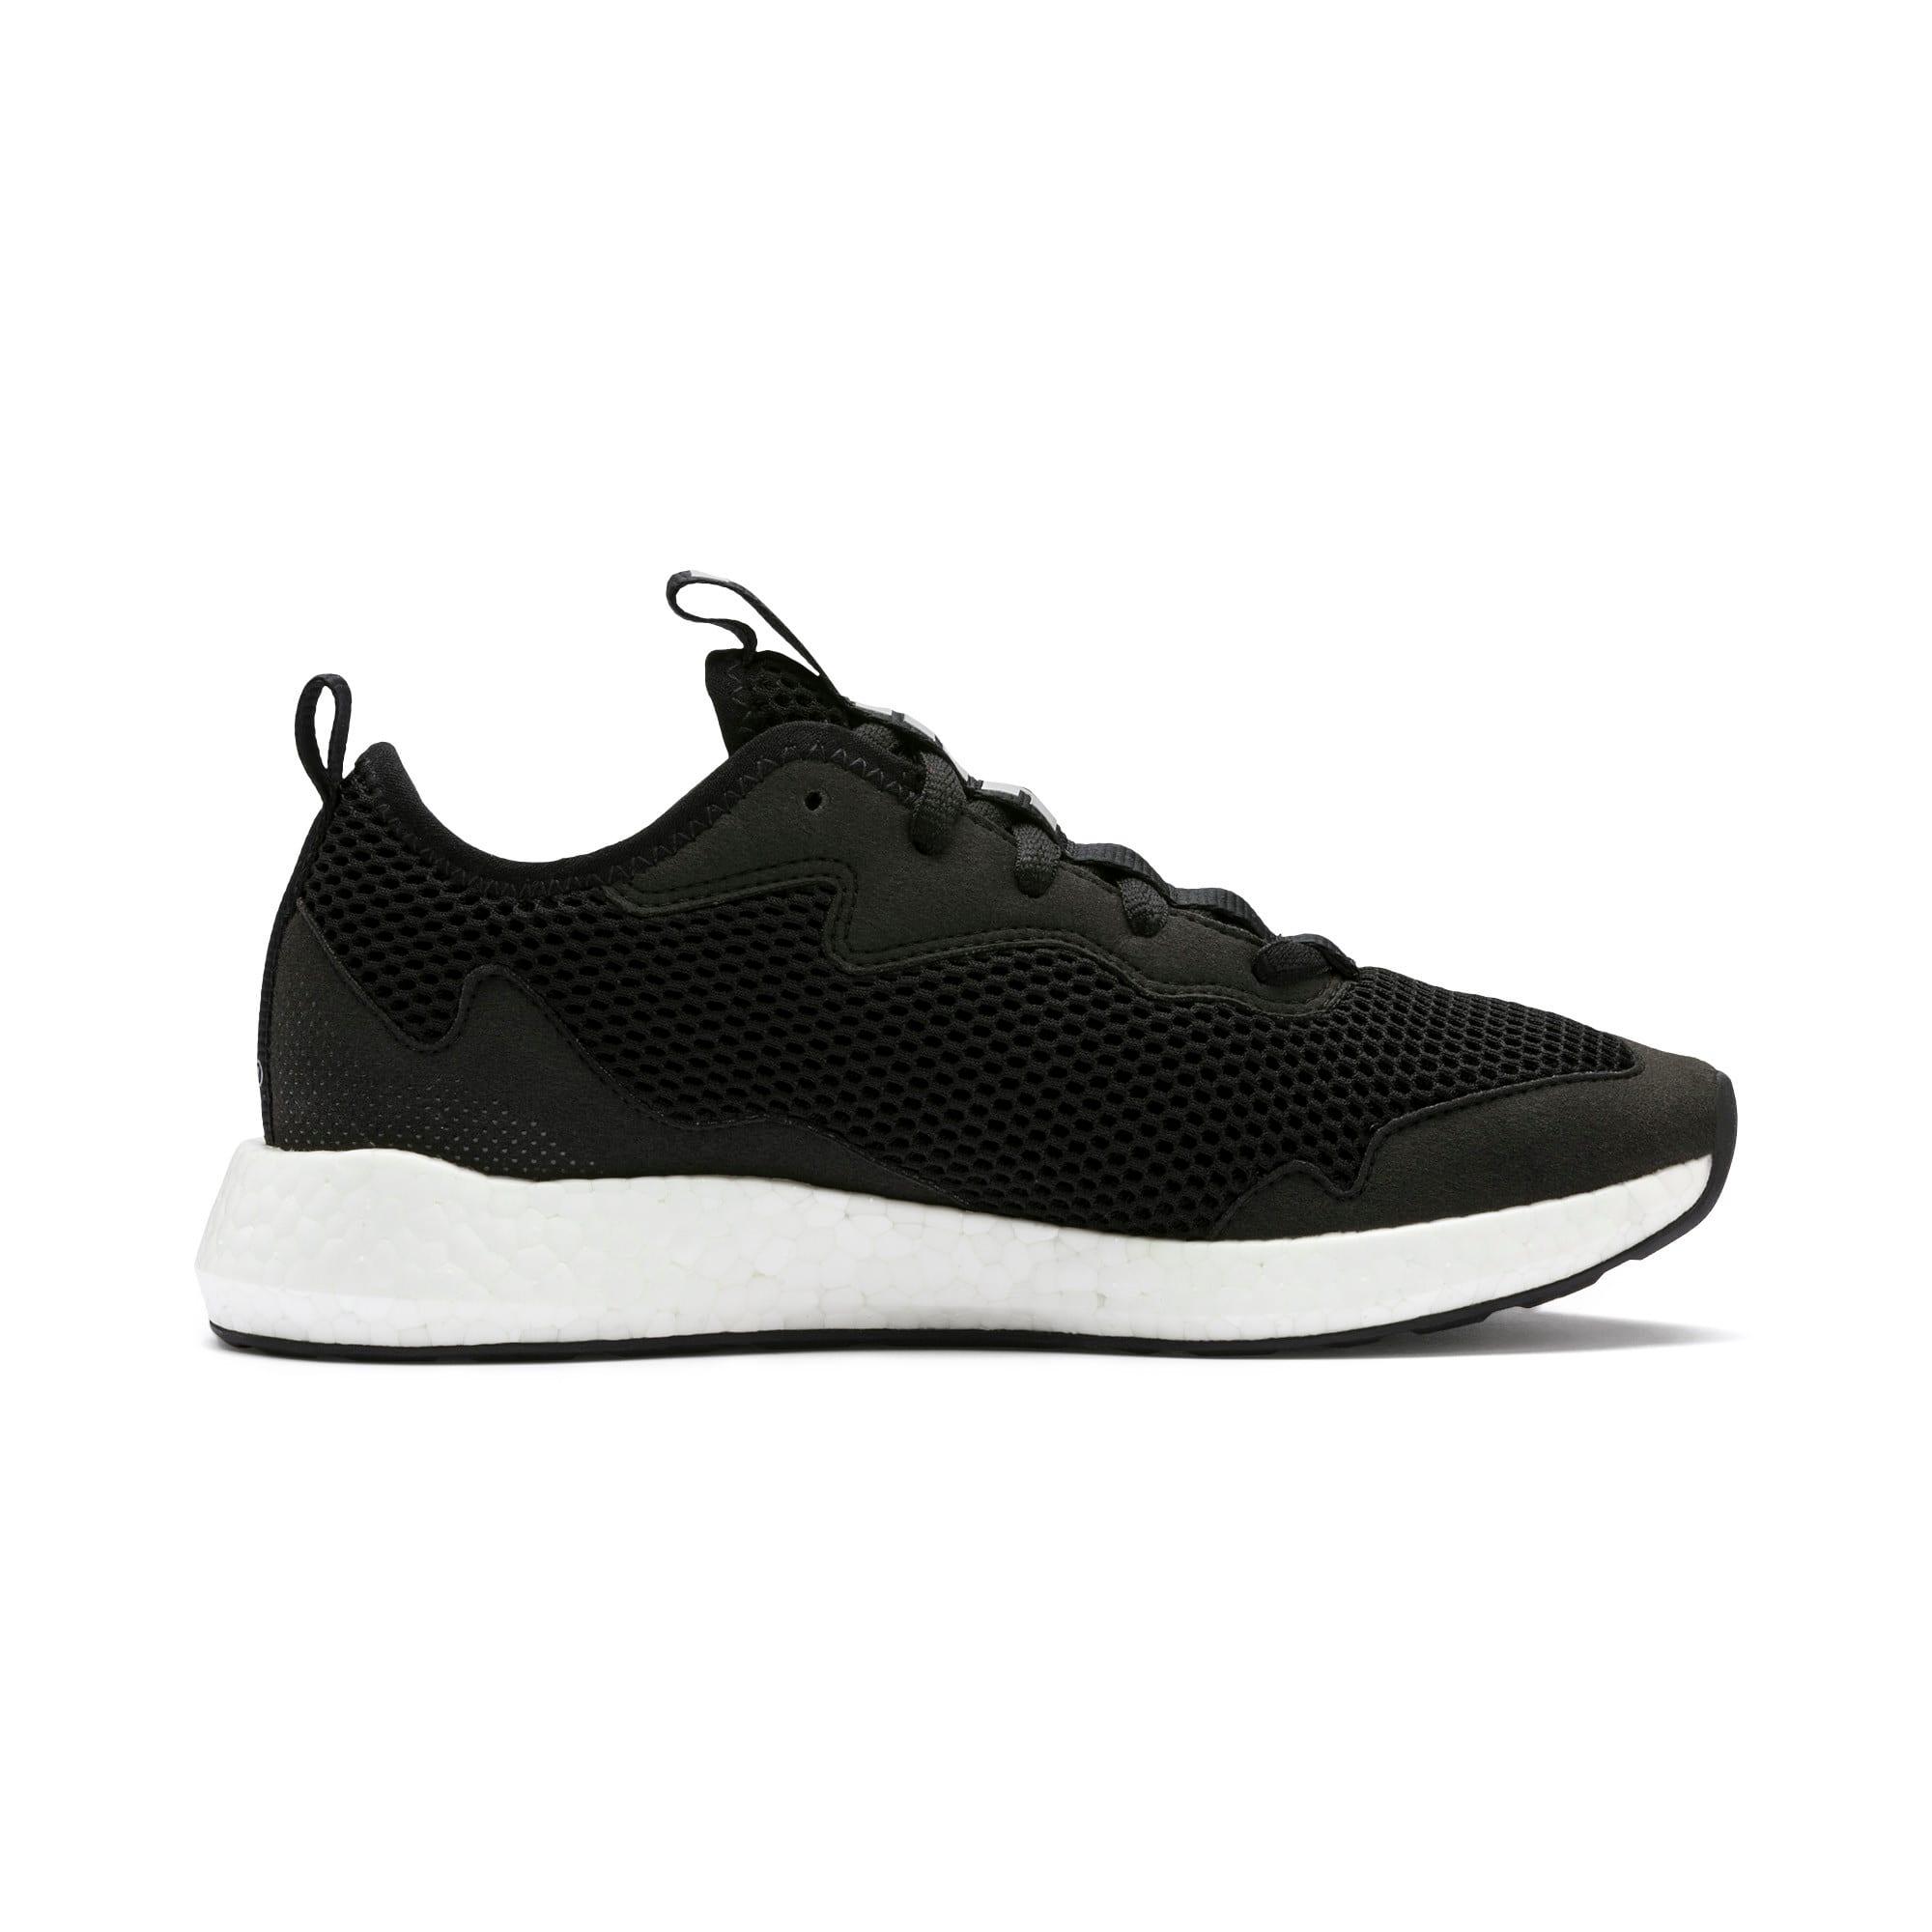 Thumbnail 6 of NRGY Neko Skim Women's Running Shoes, Puma Black-Puma Silver, medium